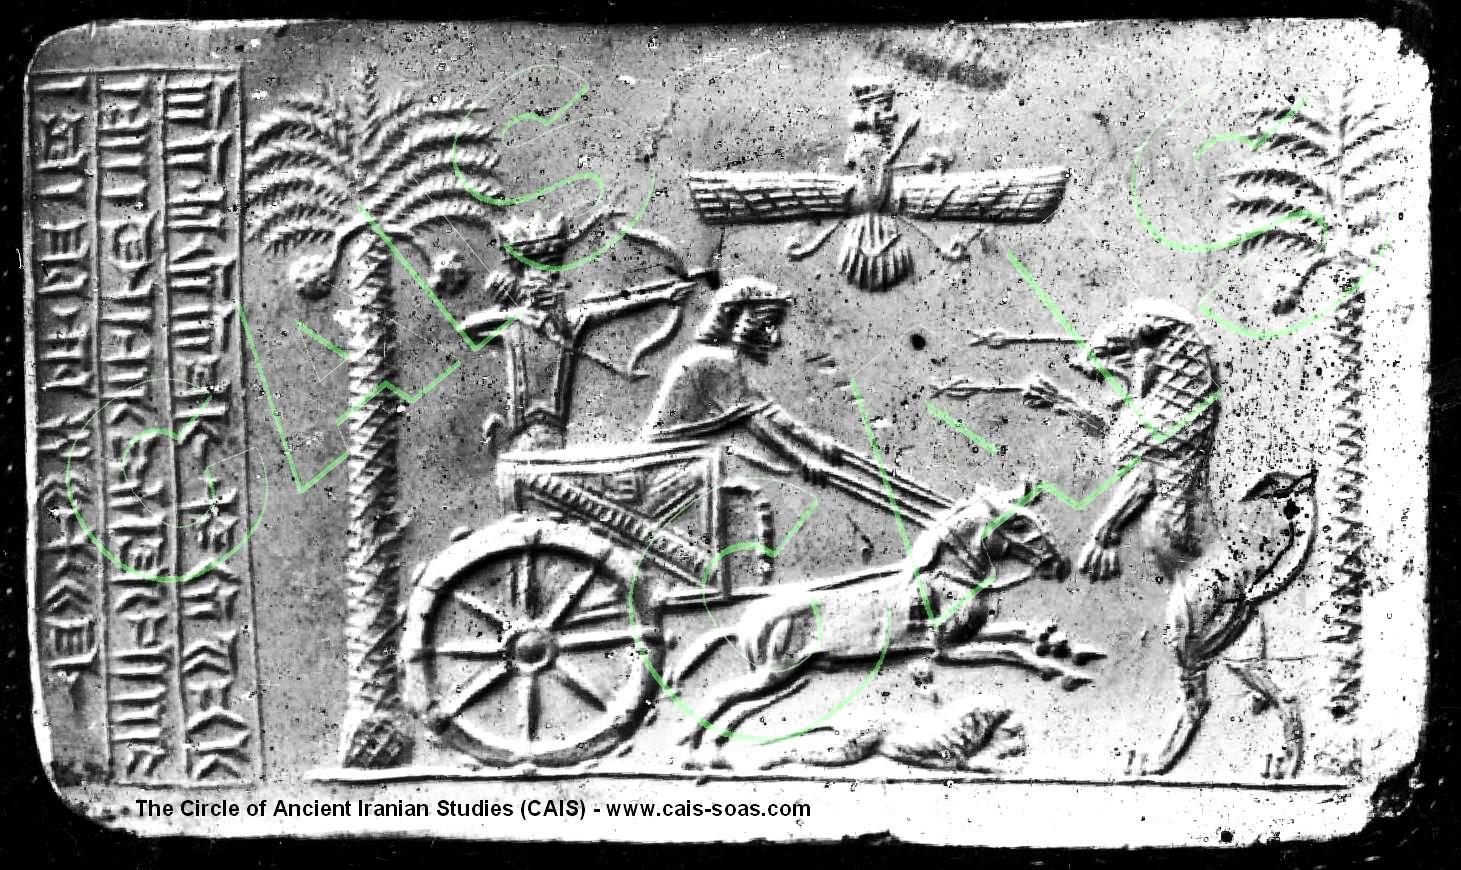 http://www.cais-soas.com/CAIS/Images2/Achaemenid/Artefacts/Seals/Seal_of_Darius_the_GreatWM.JPG